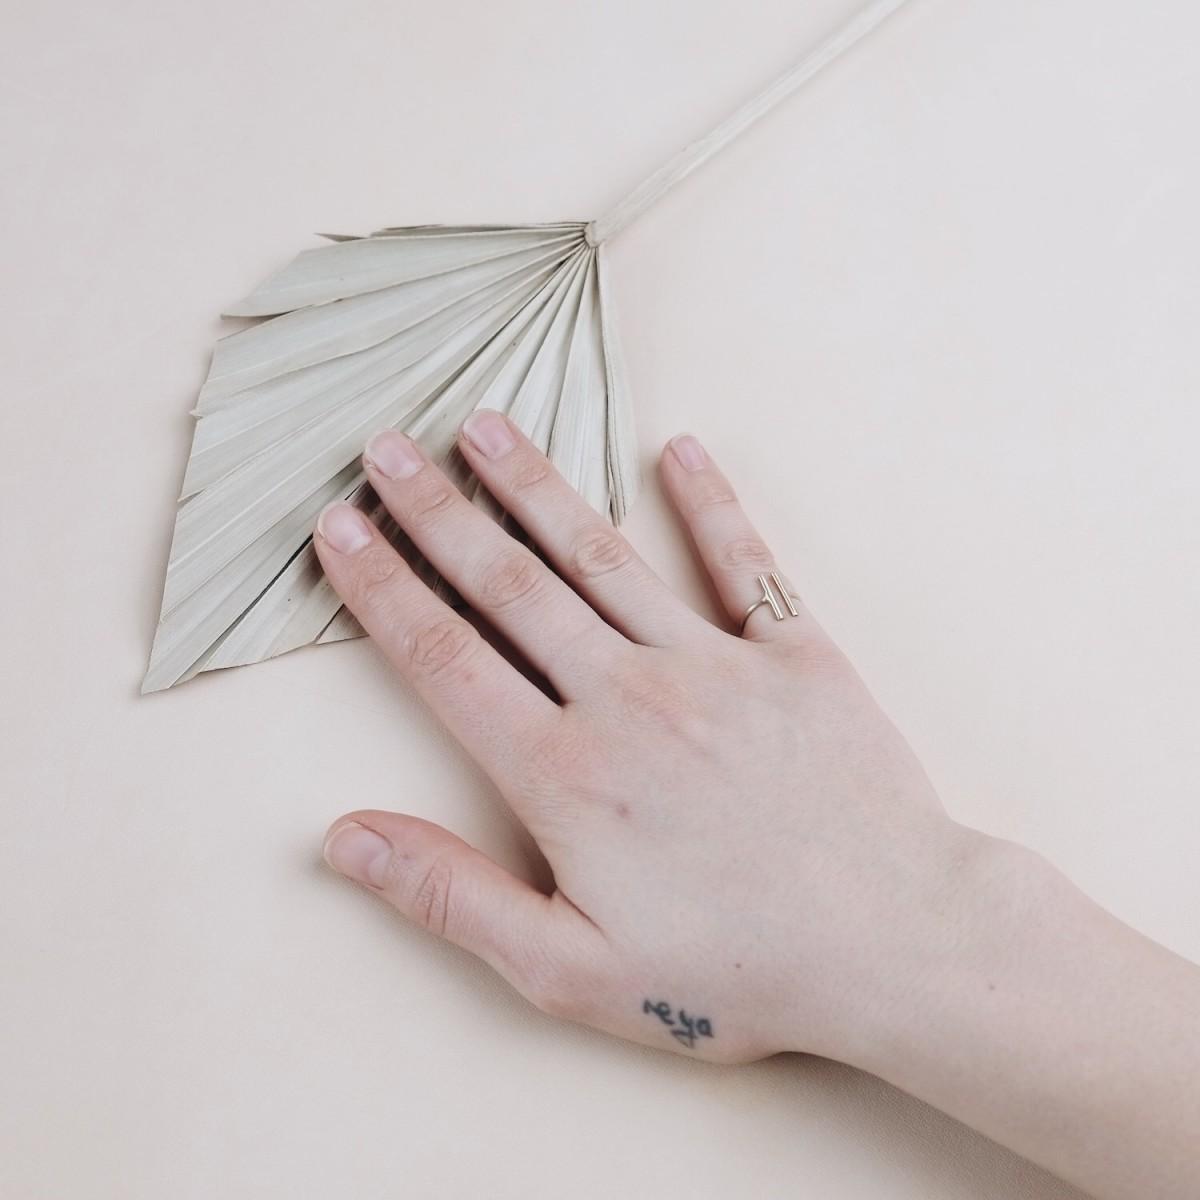 BRASSCAKE // Mini T Ring